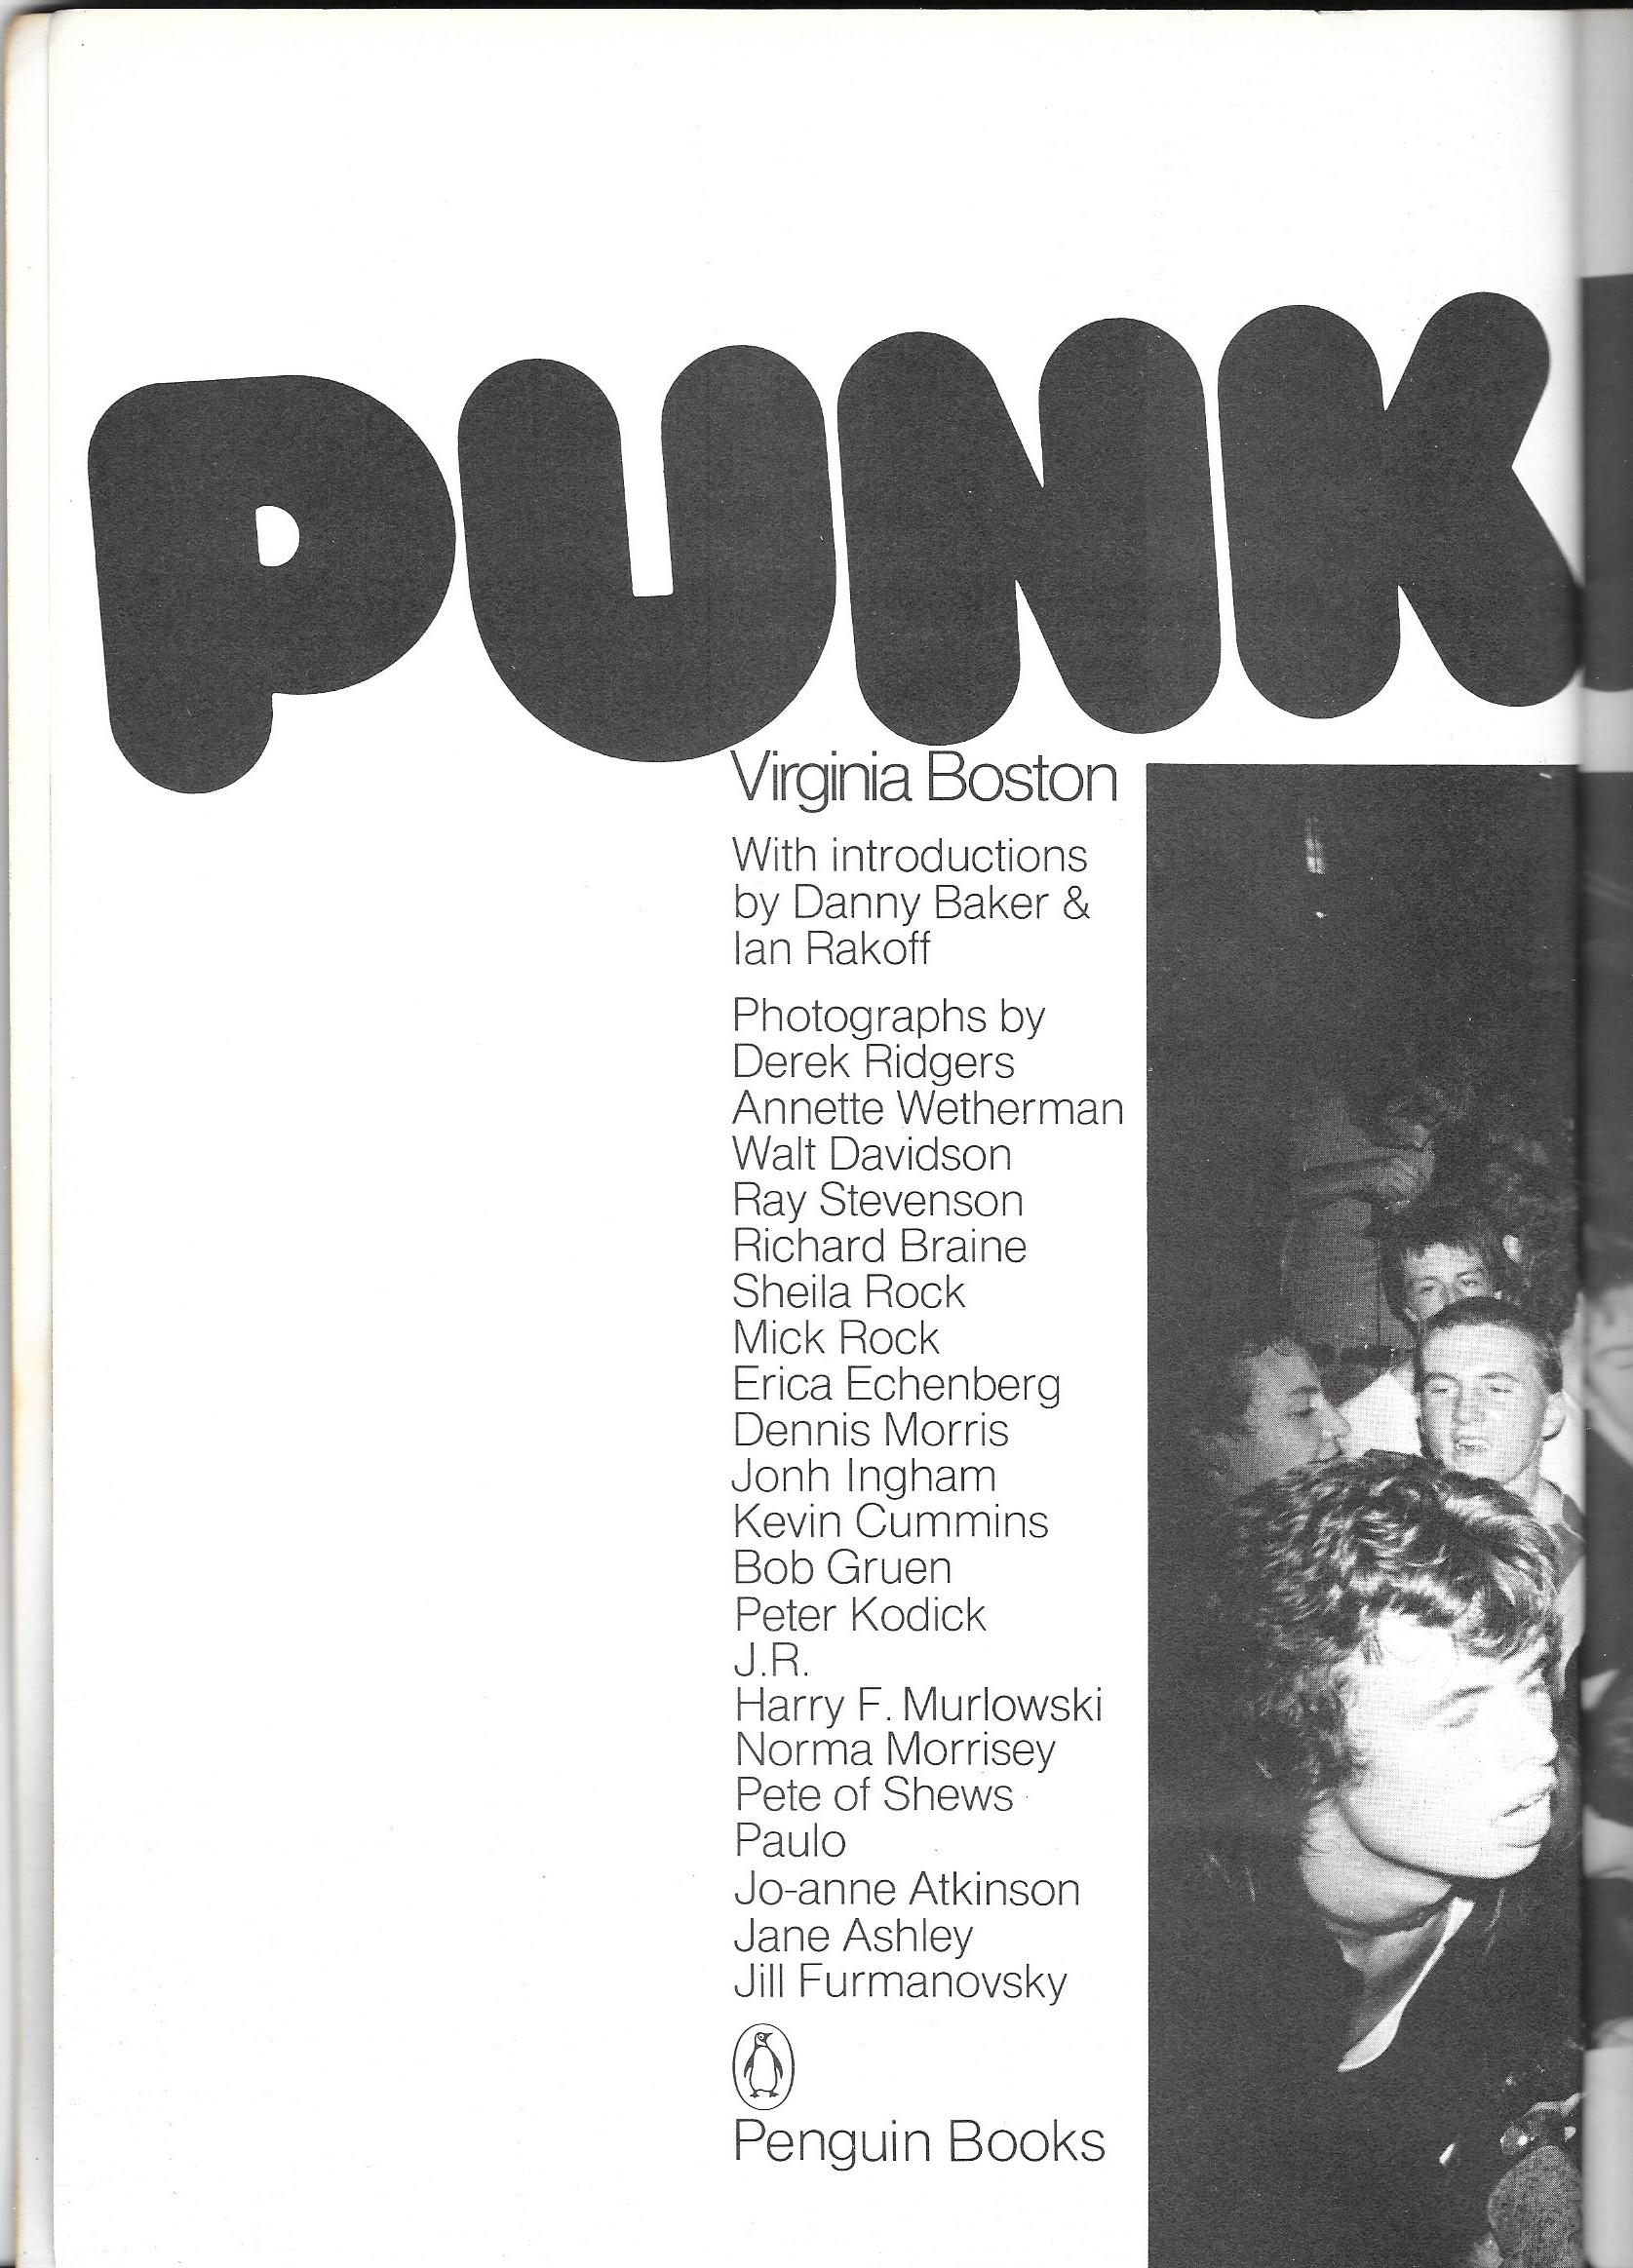 Punk Rock by VIrginia Boston 1978 - Index Page left - US Version.jpg